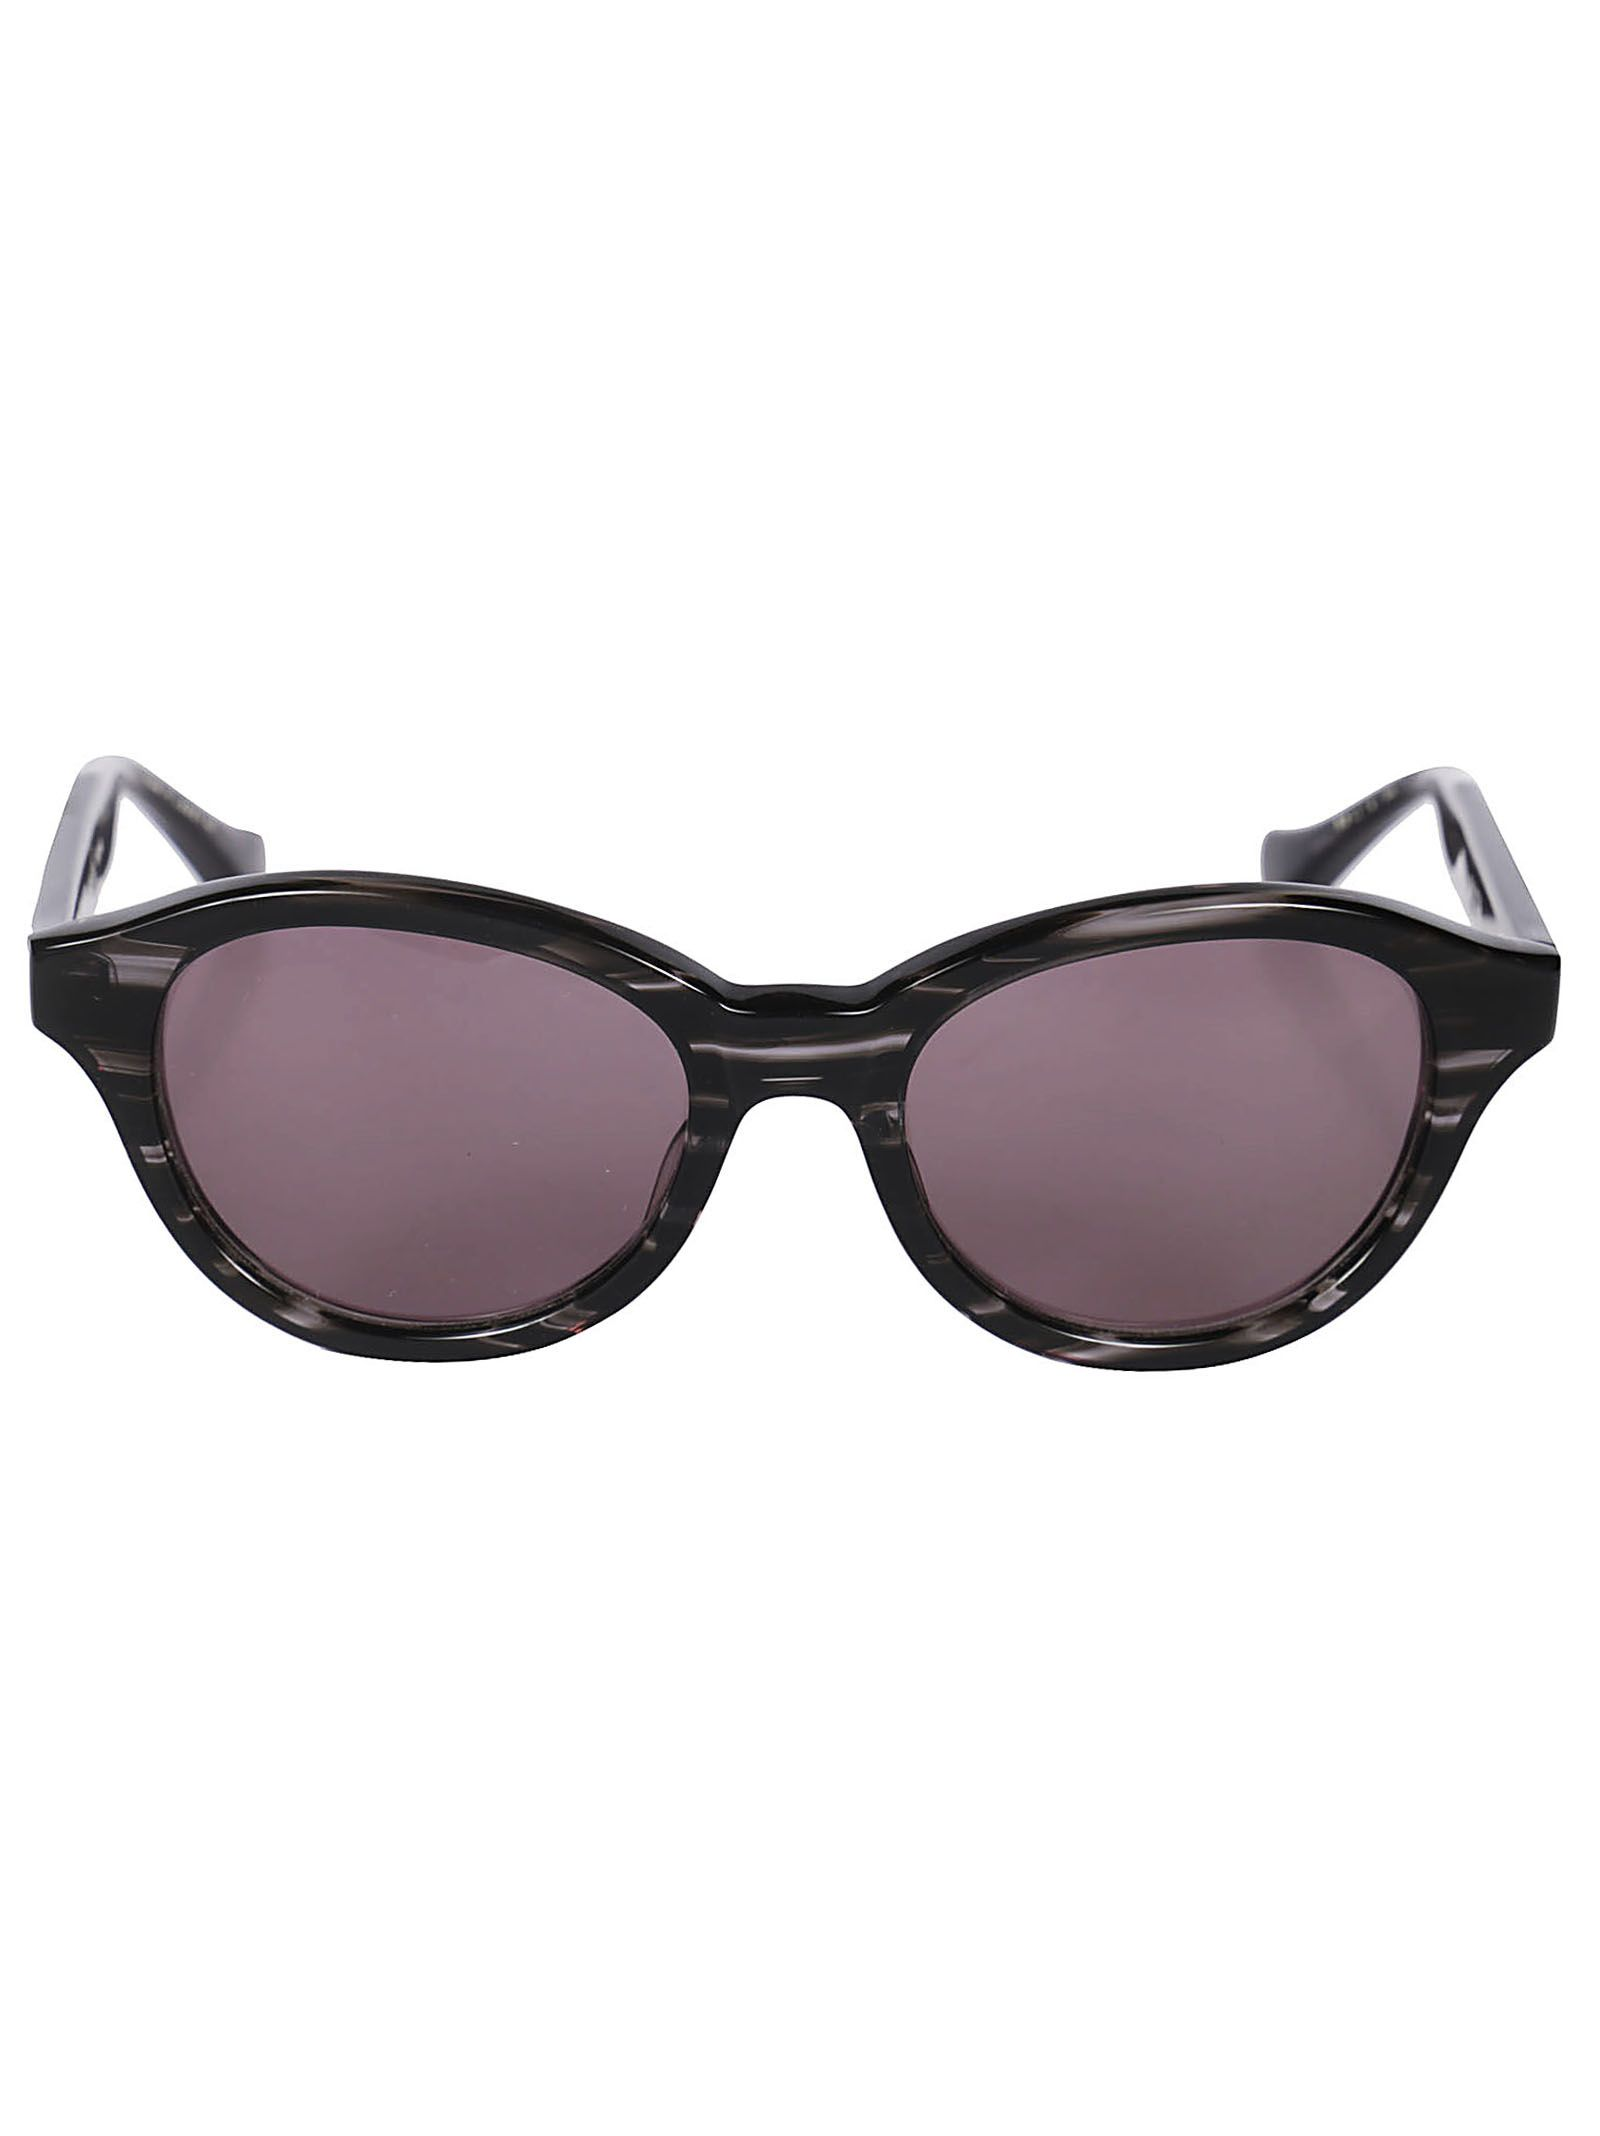 Dita Corsica Round Frame Sunglasses